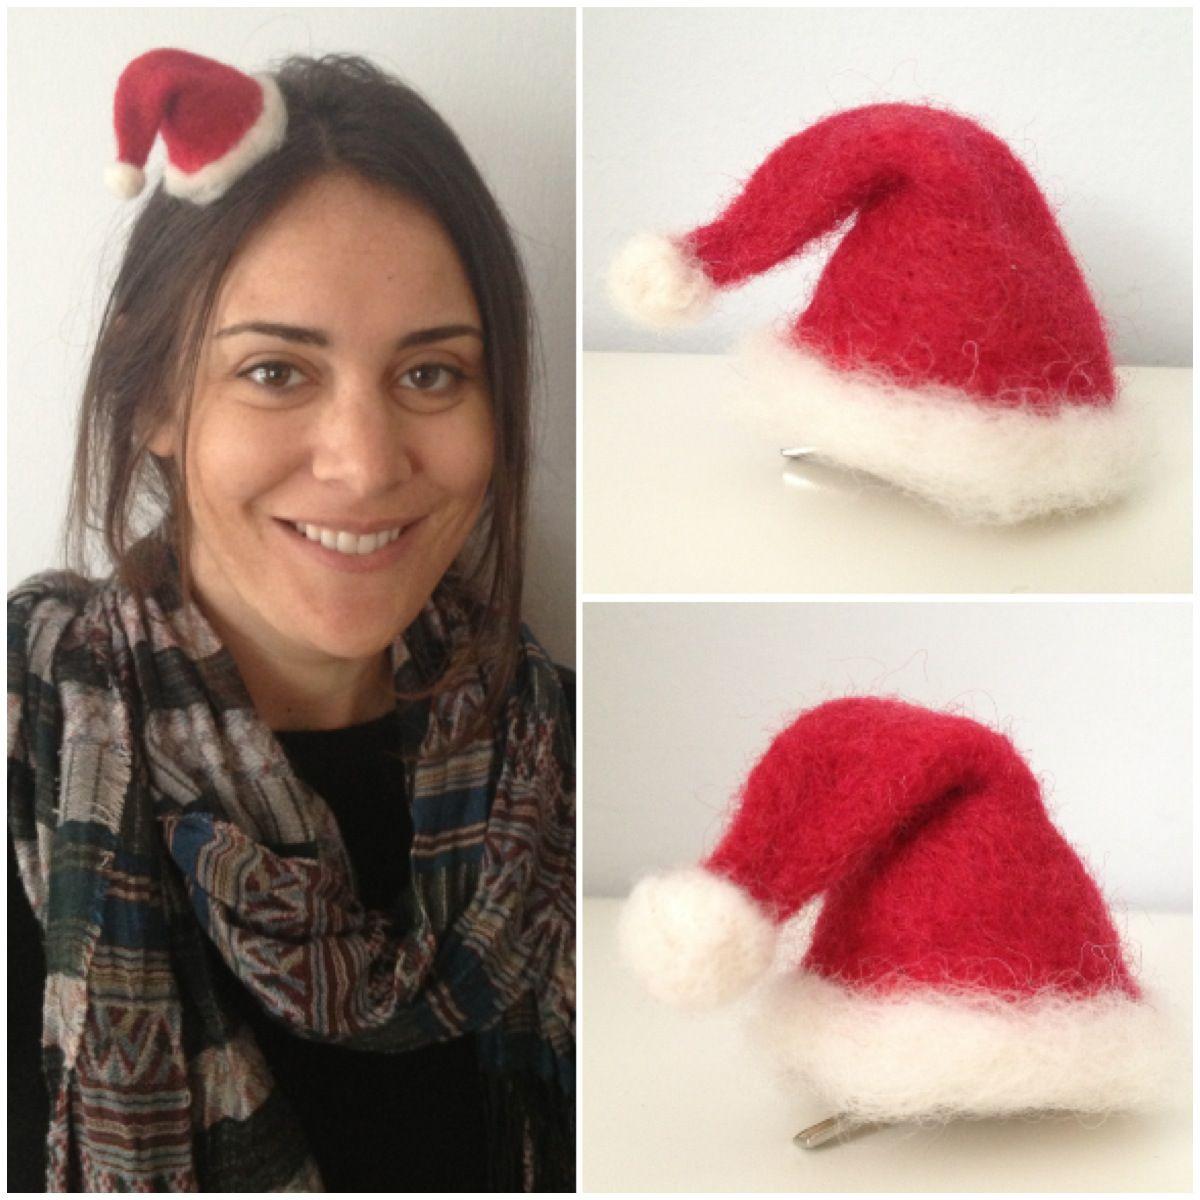 Tiny santa hat by Alison Eder minimilliner@gmail.com #hats #craft #needlefelt #tinyhat #christmas #santahat #santa